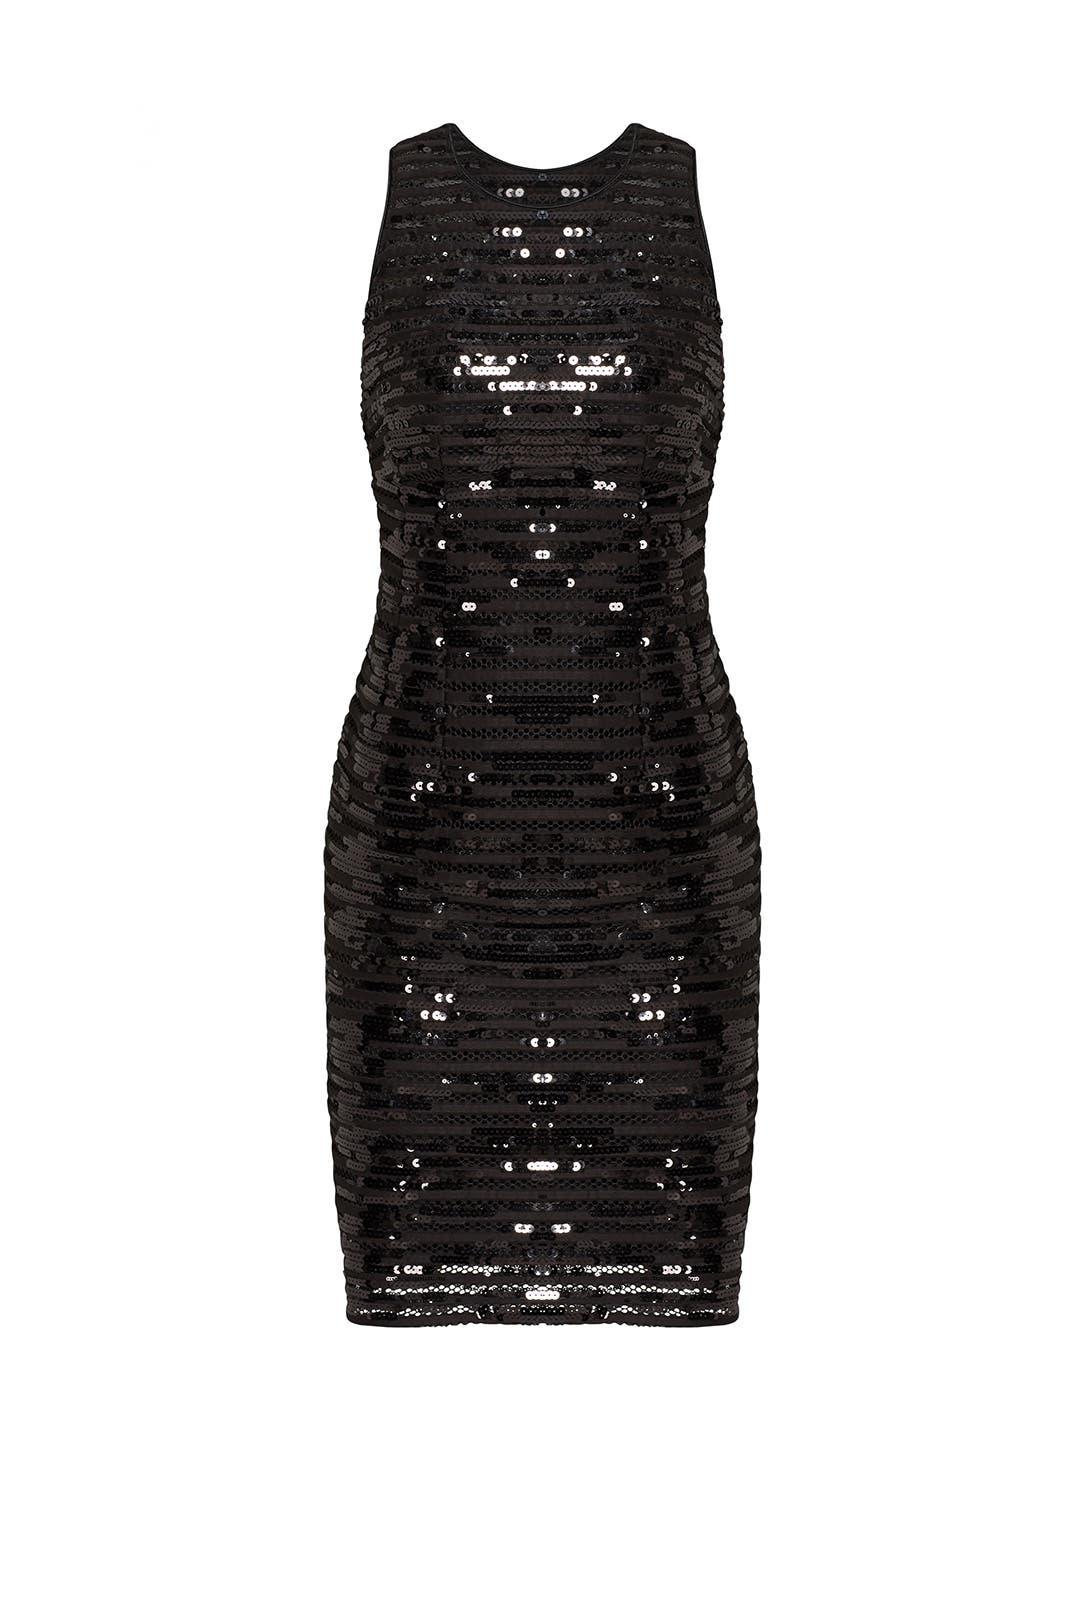 a8b838ed0d Black Sequin Stripe Sheath by Nanette Lepore for  48